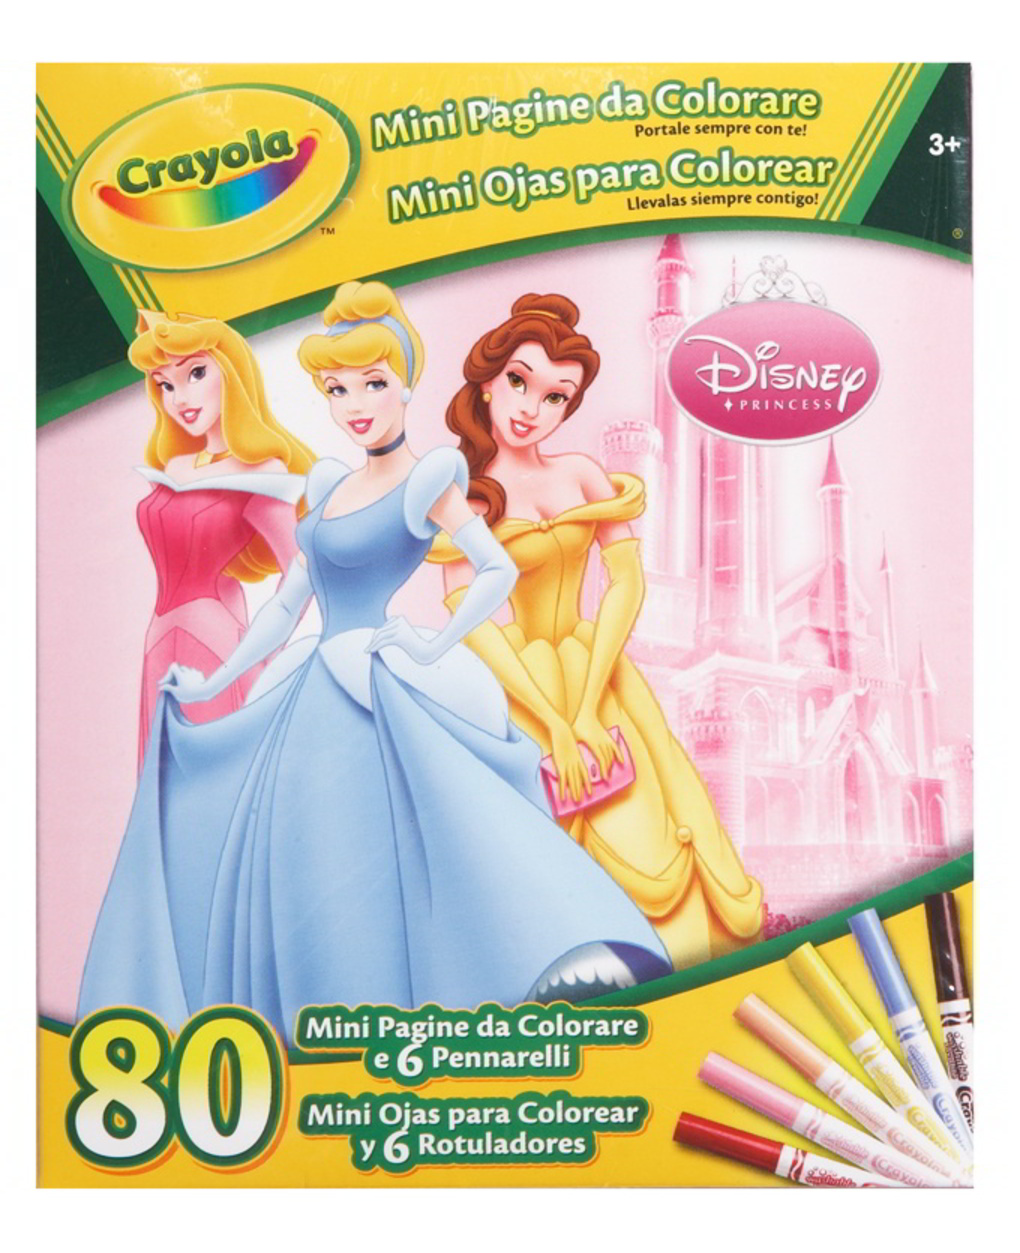 Crayola - disney mini pagine - Crayola